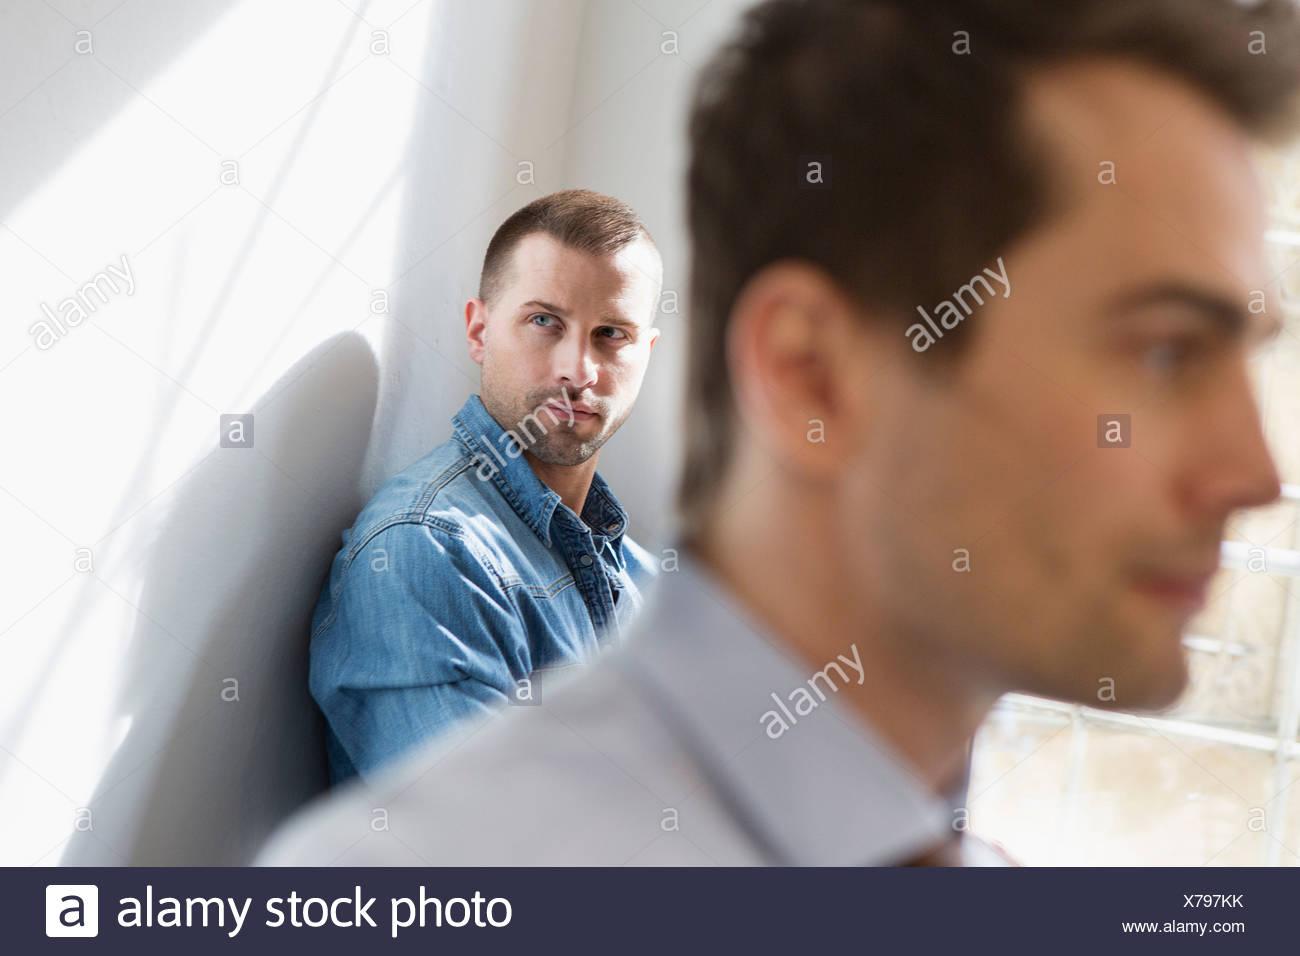 Mid adult man wearing denim shirt, man in foreground - Stock Image